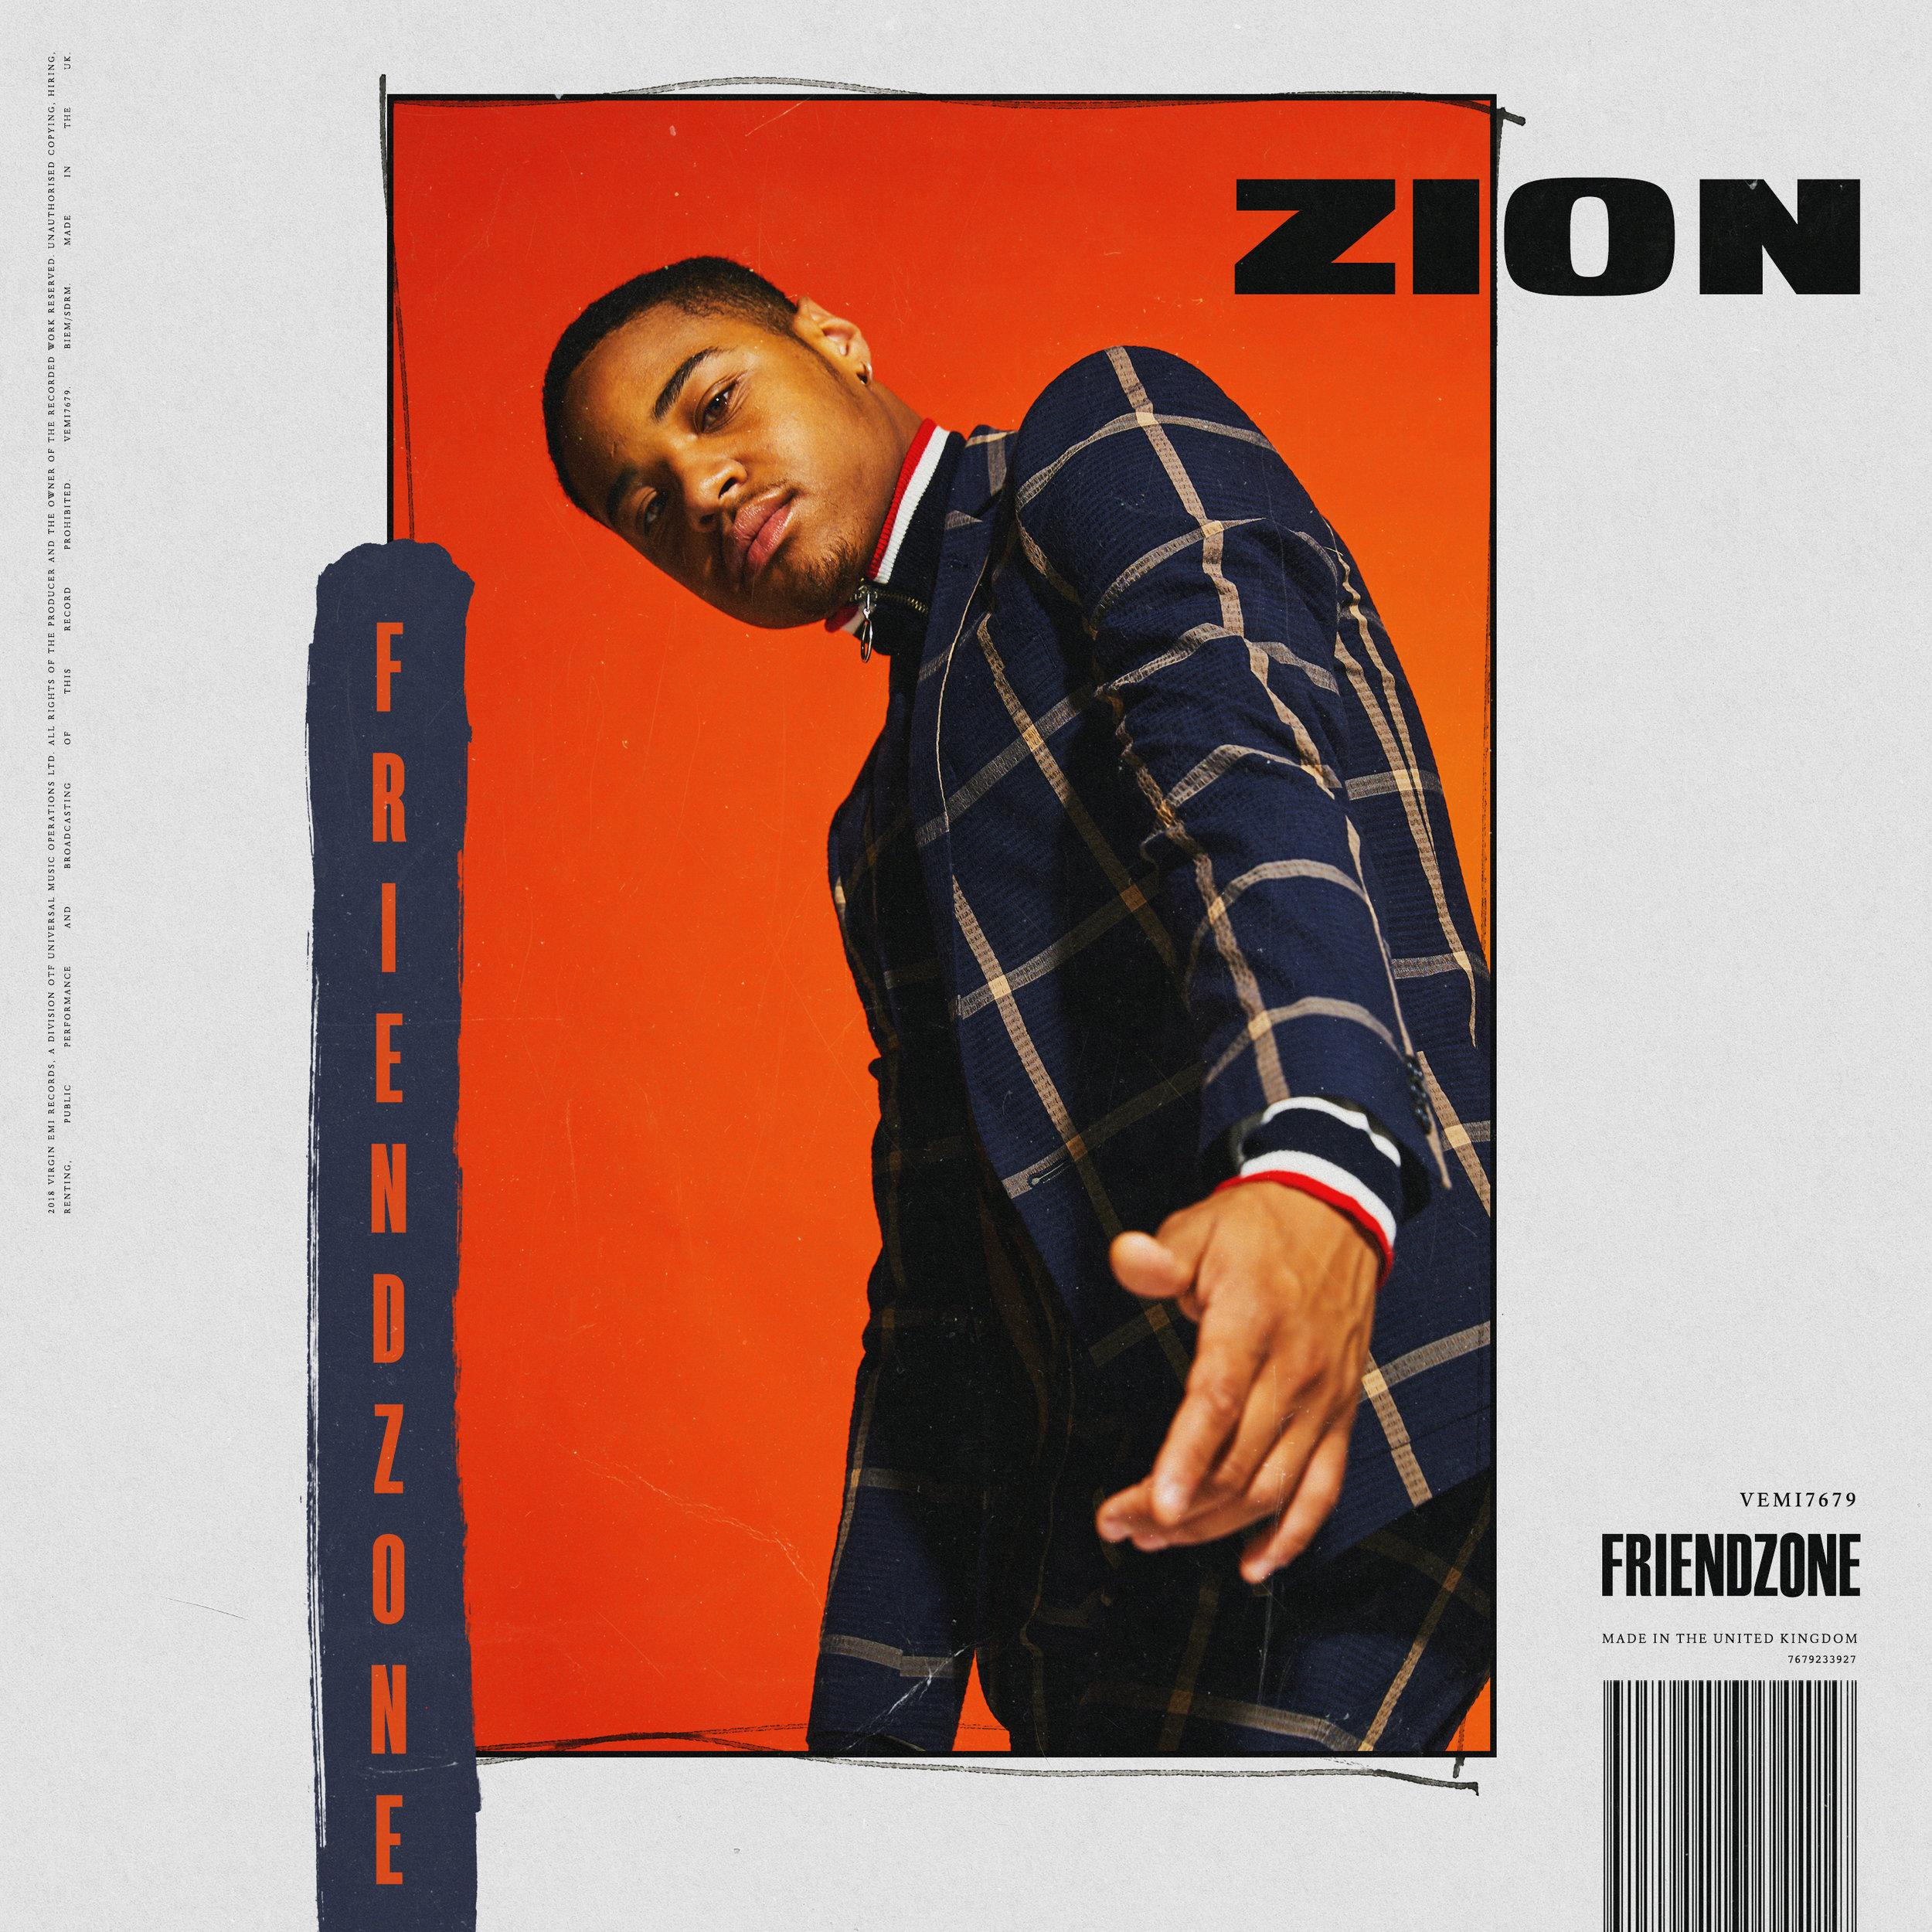 Zion - Friendzone